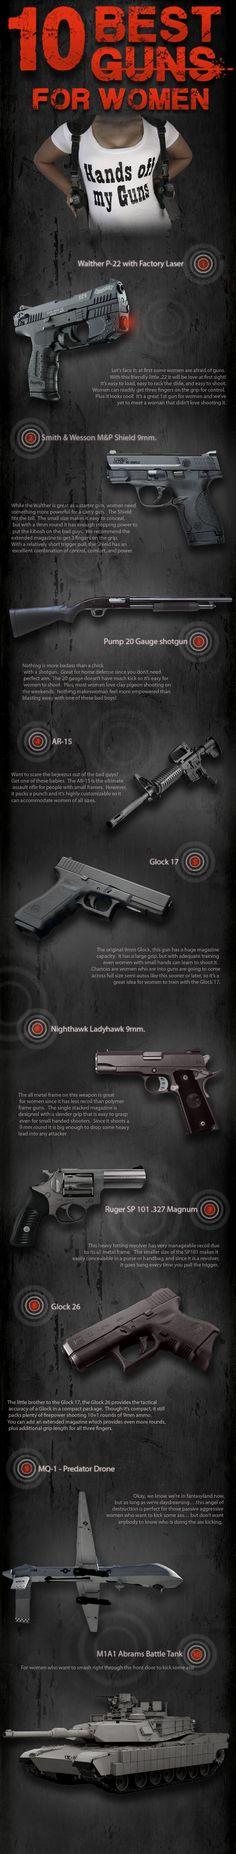 The 10 Best Guns for Women. Love it